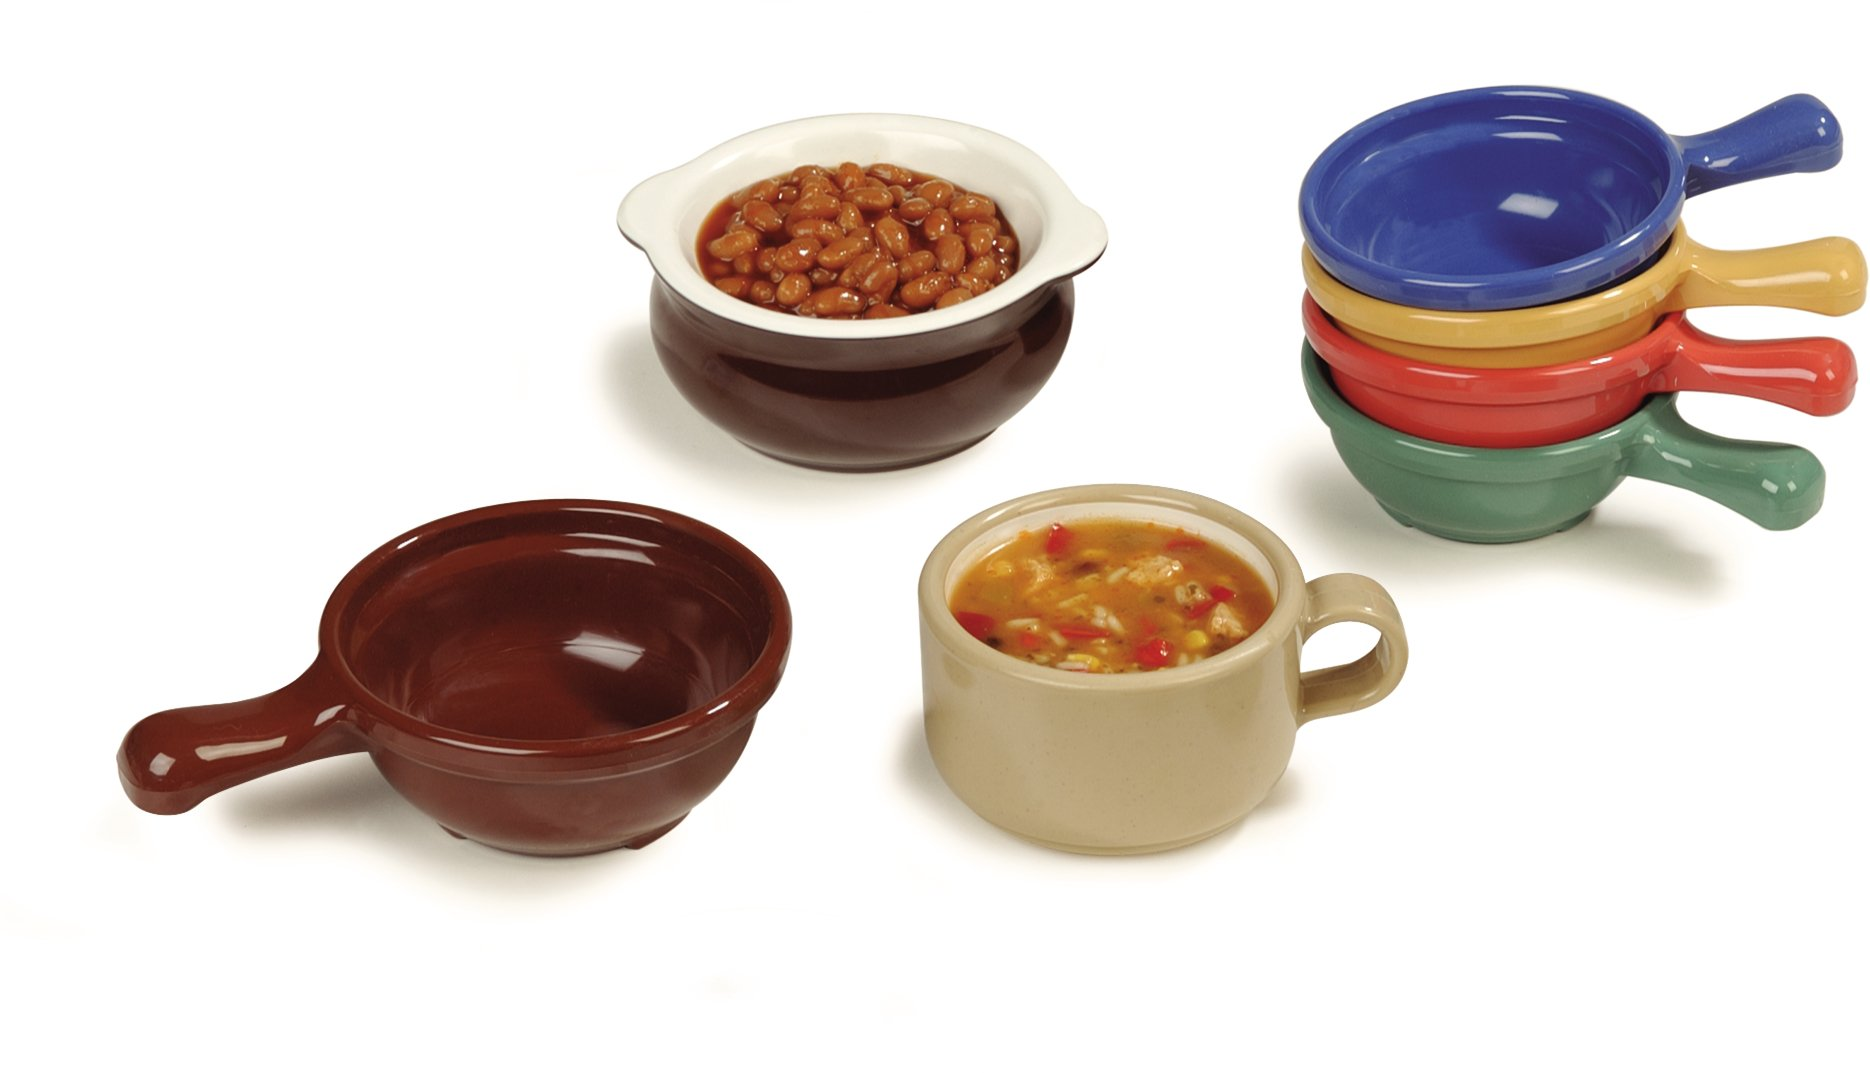 Carlisle 700614 Plastic Handled Soup Bowl, 8 oz., Ocean Blue (Pack of 24) by Carlisle (Image #8)